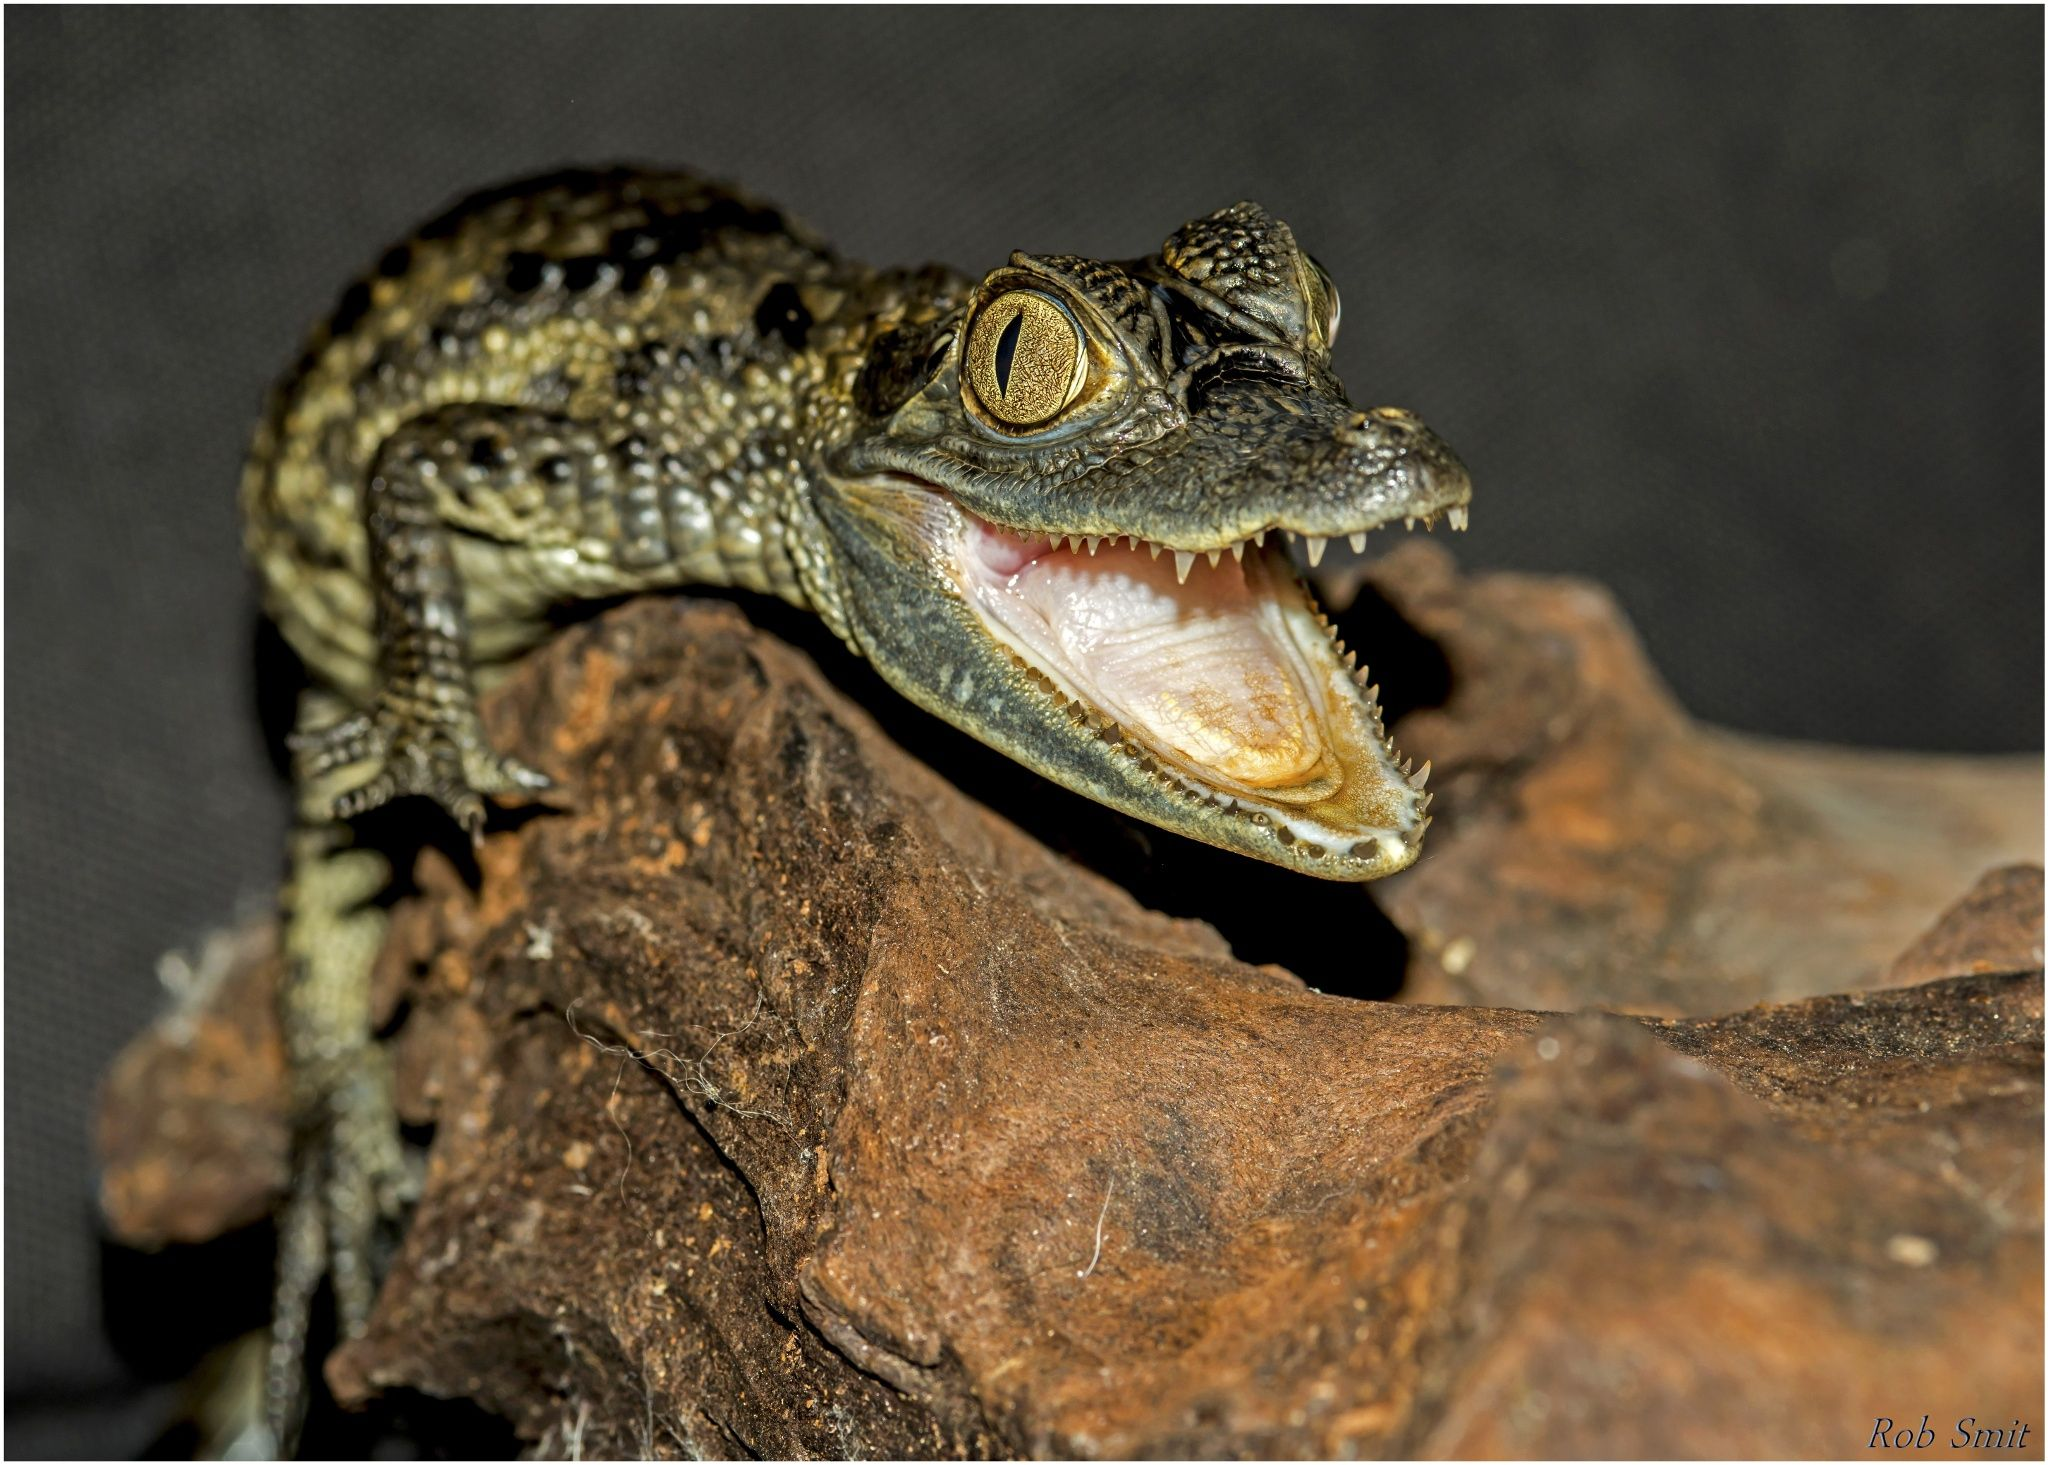 079936a598f3 Very little crocodile by Rob Smit on 500px Krokodil Cayman Kaaiman Dieren  Animals Natuur Nature Close Up Copyright  freezefotografie gmail.com Foto  door  ...